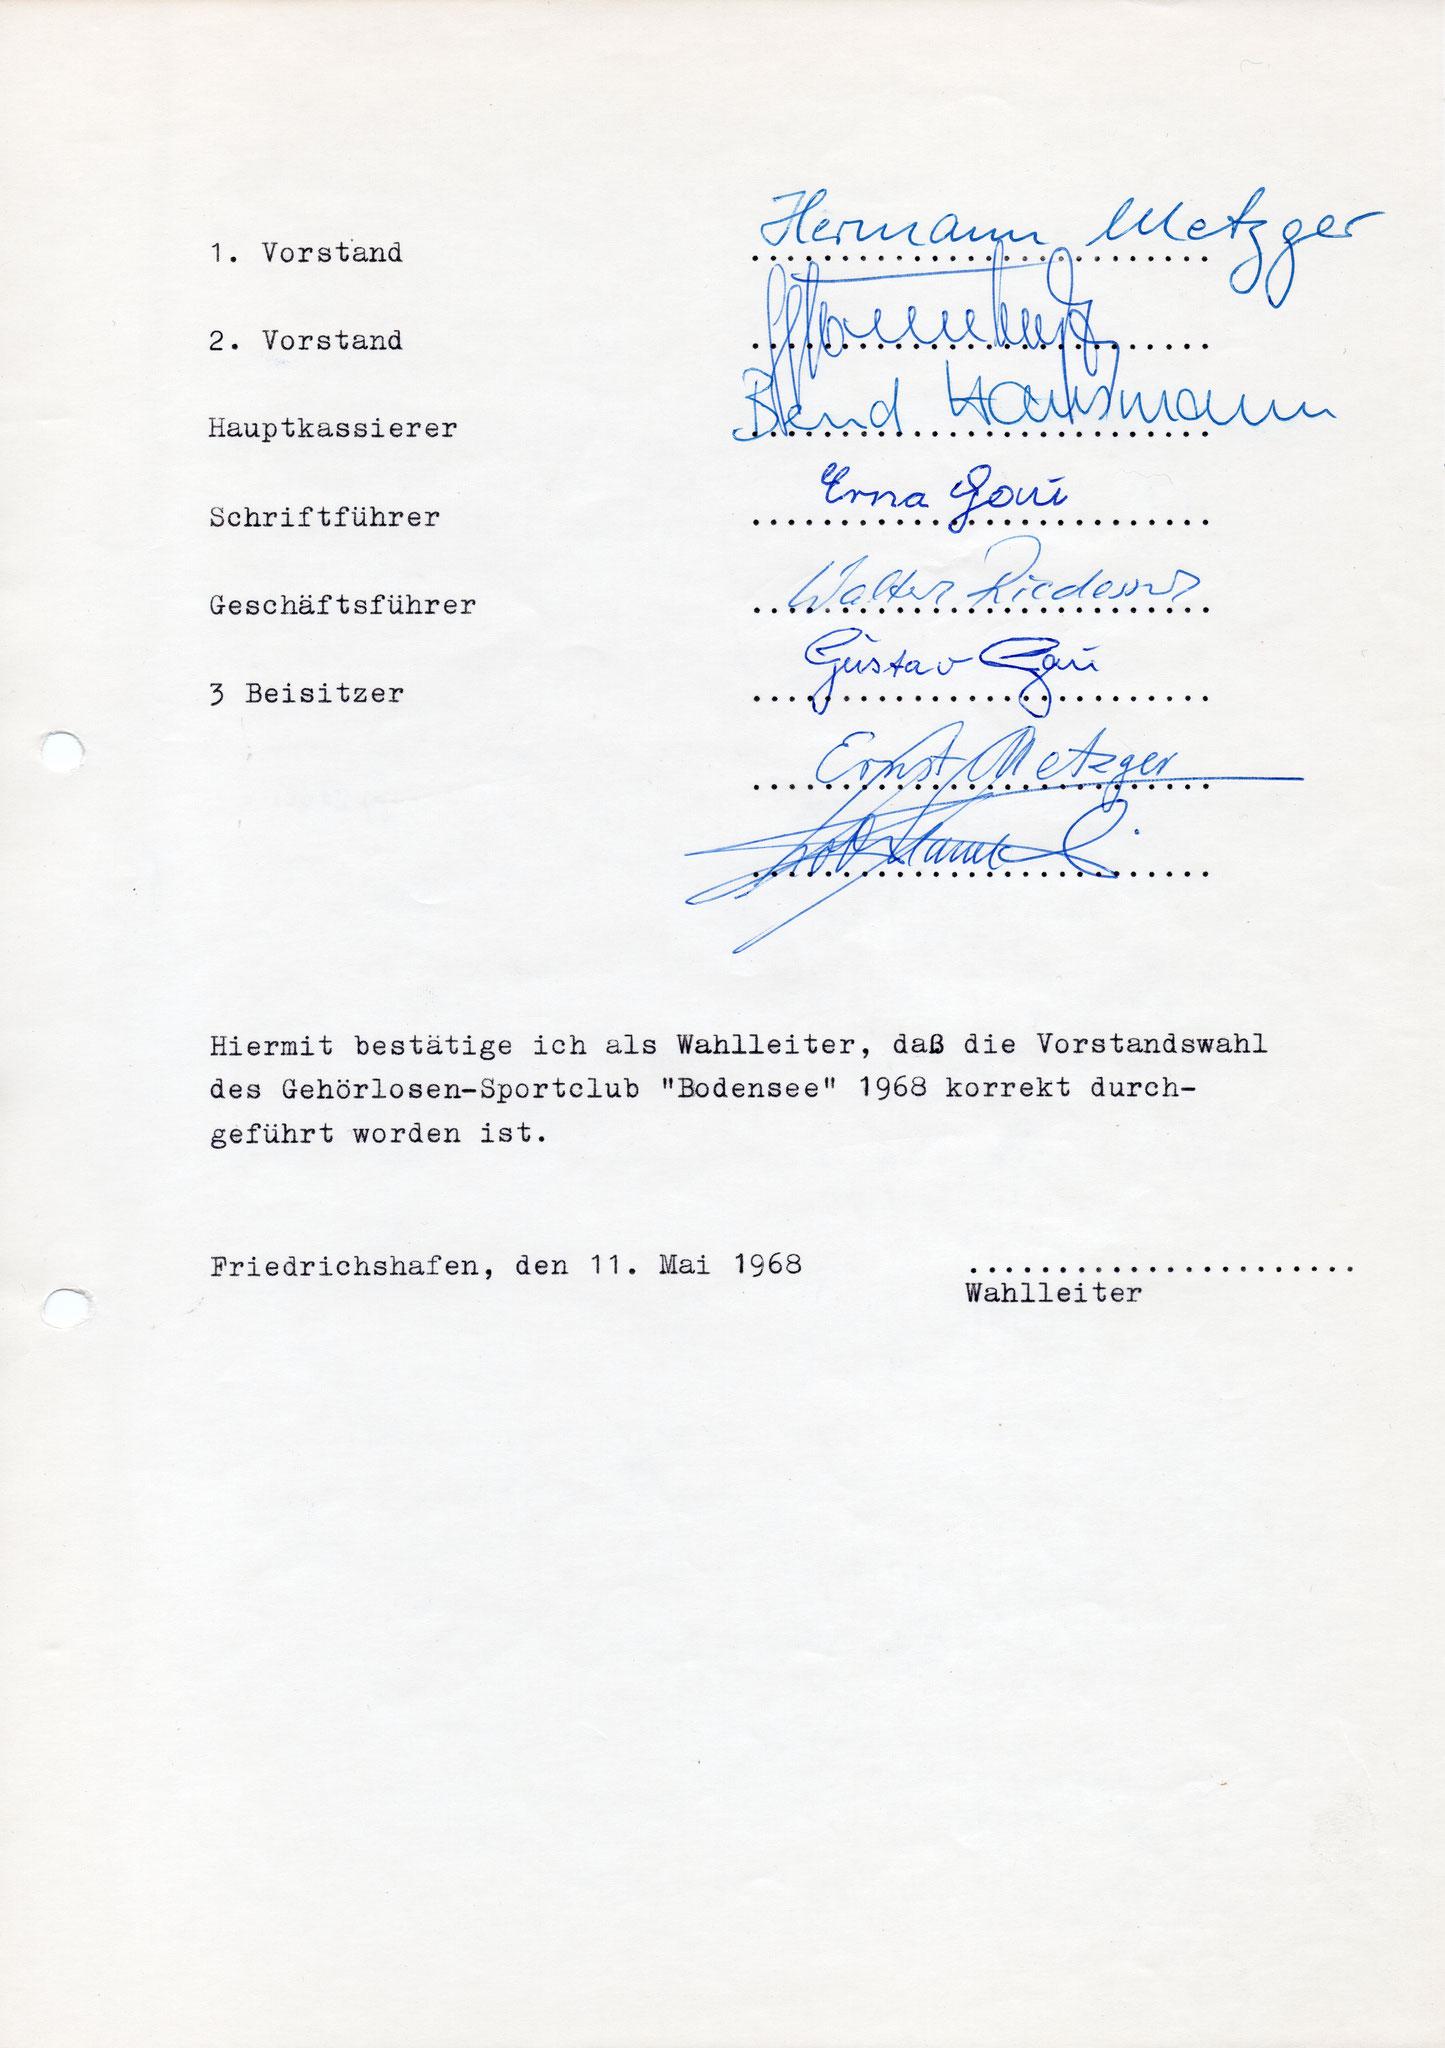 Protokoll Wahlversammlung 11.05.1968